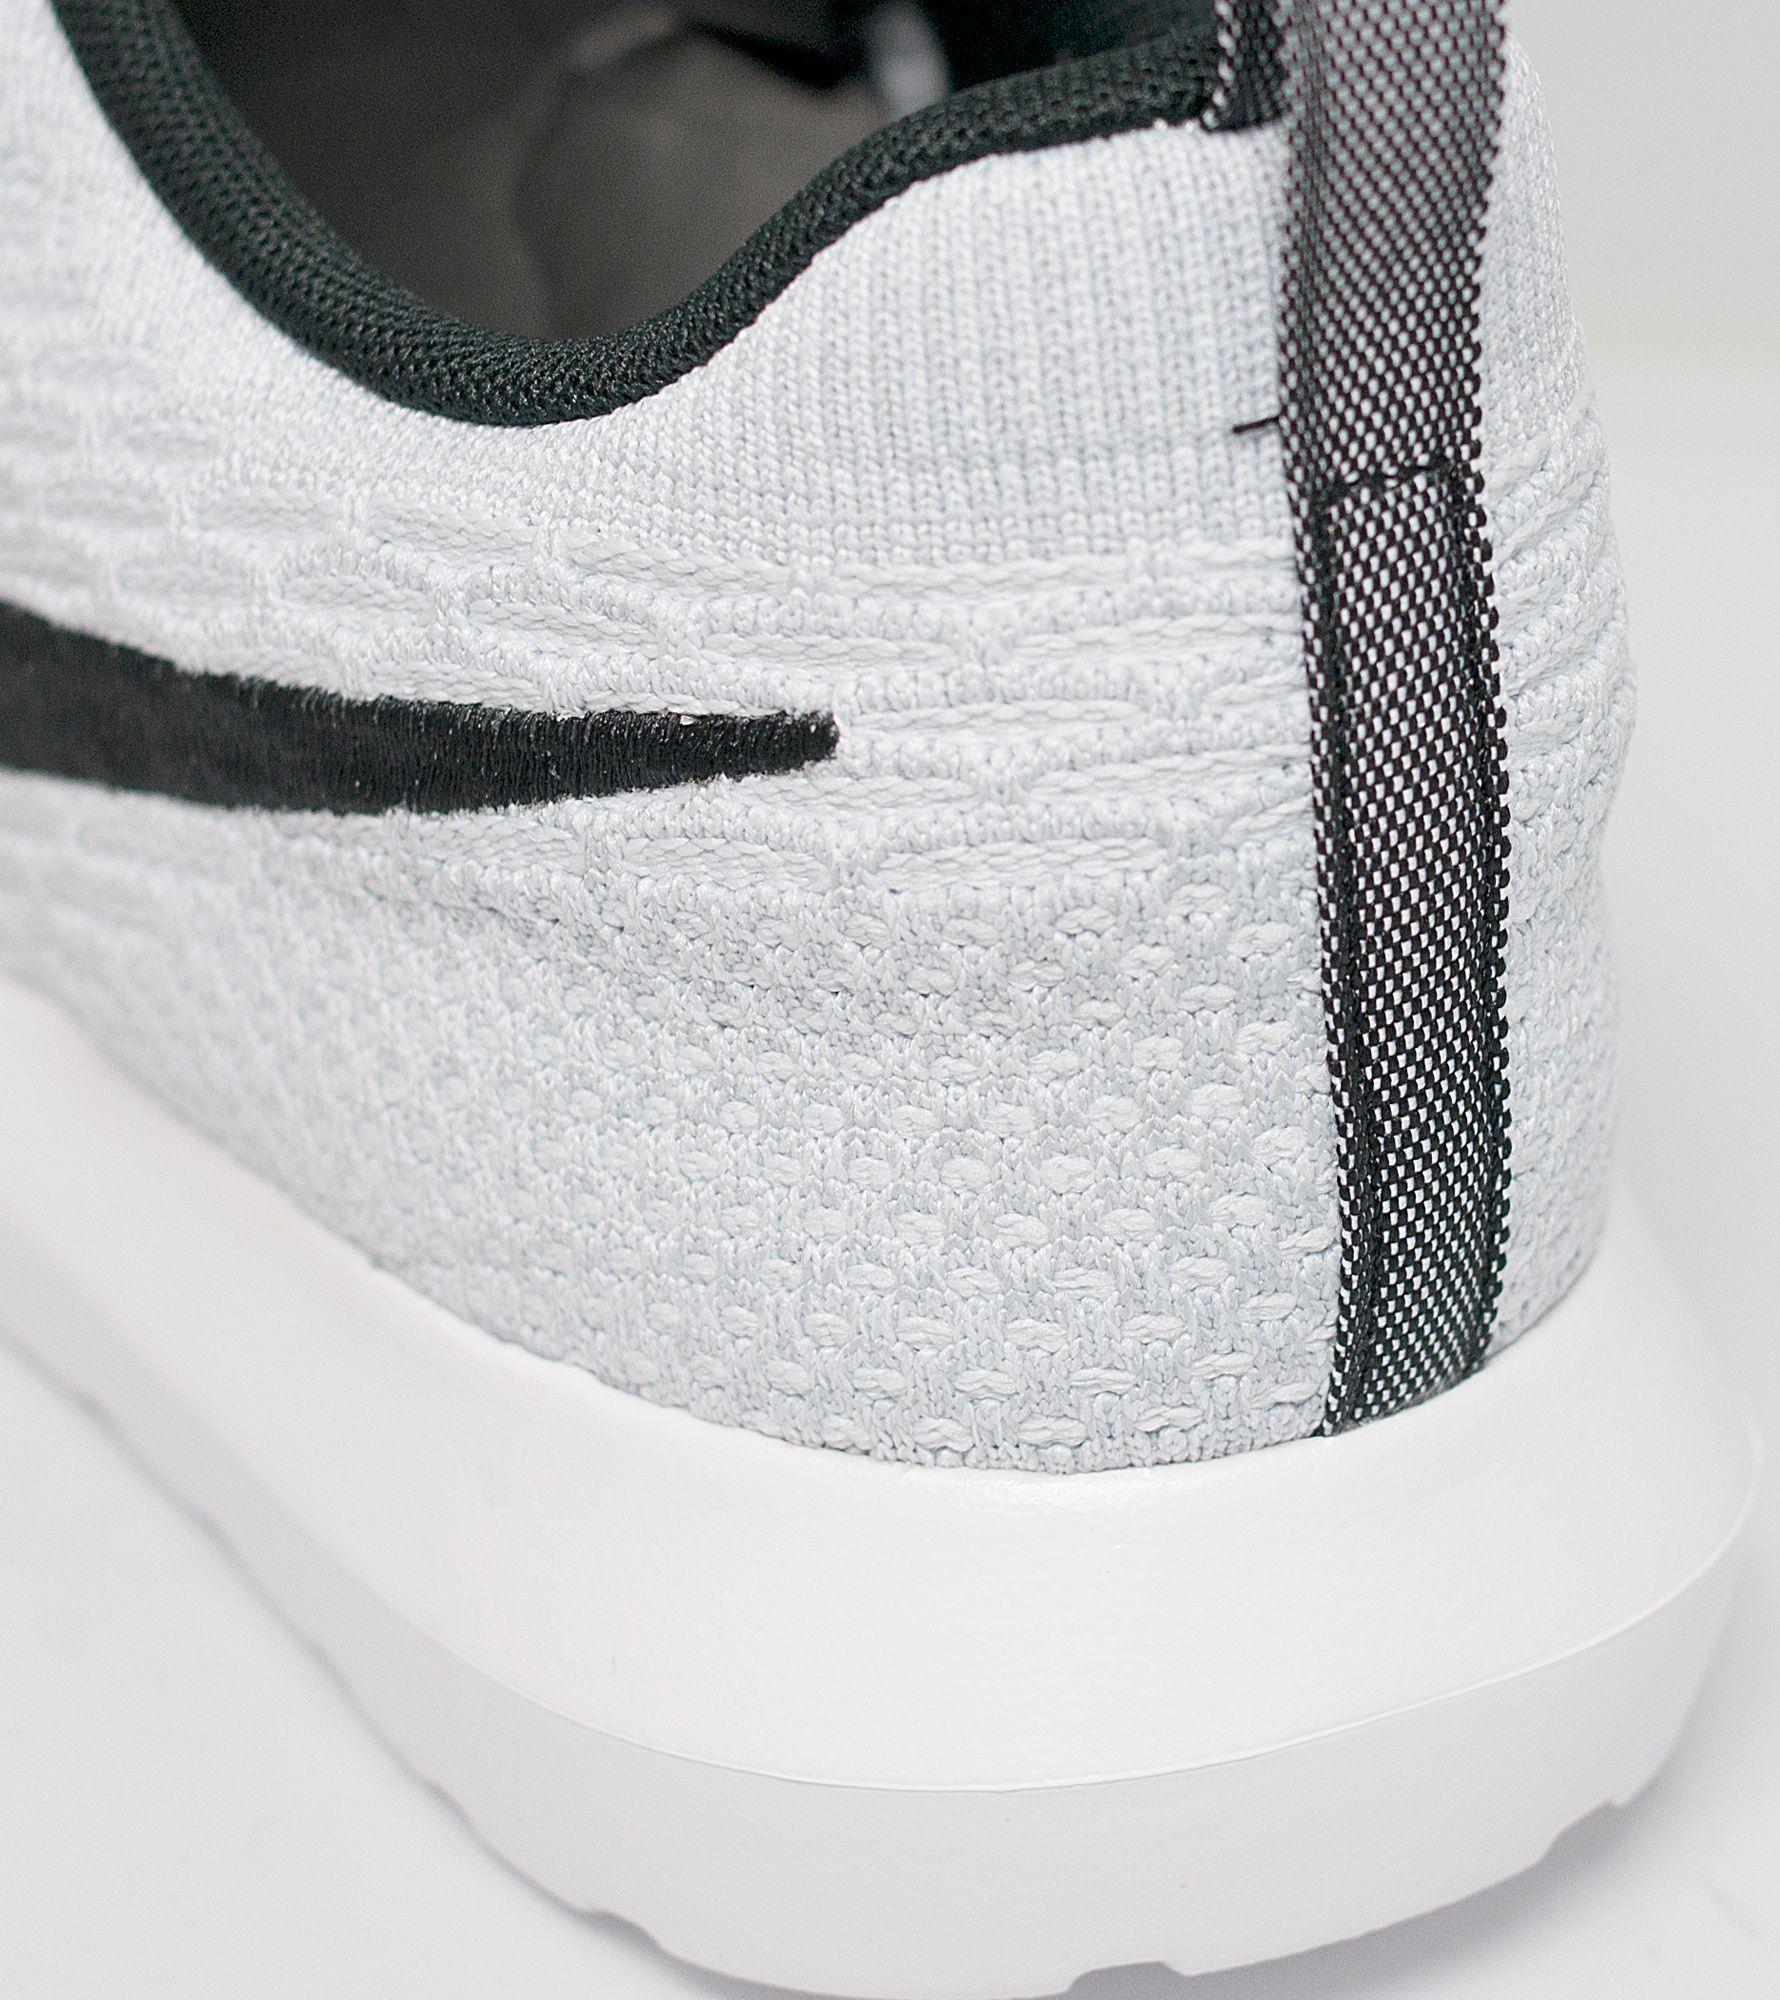 nstbv Nike Roshe One Flyknit | Size?